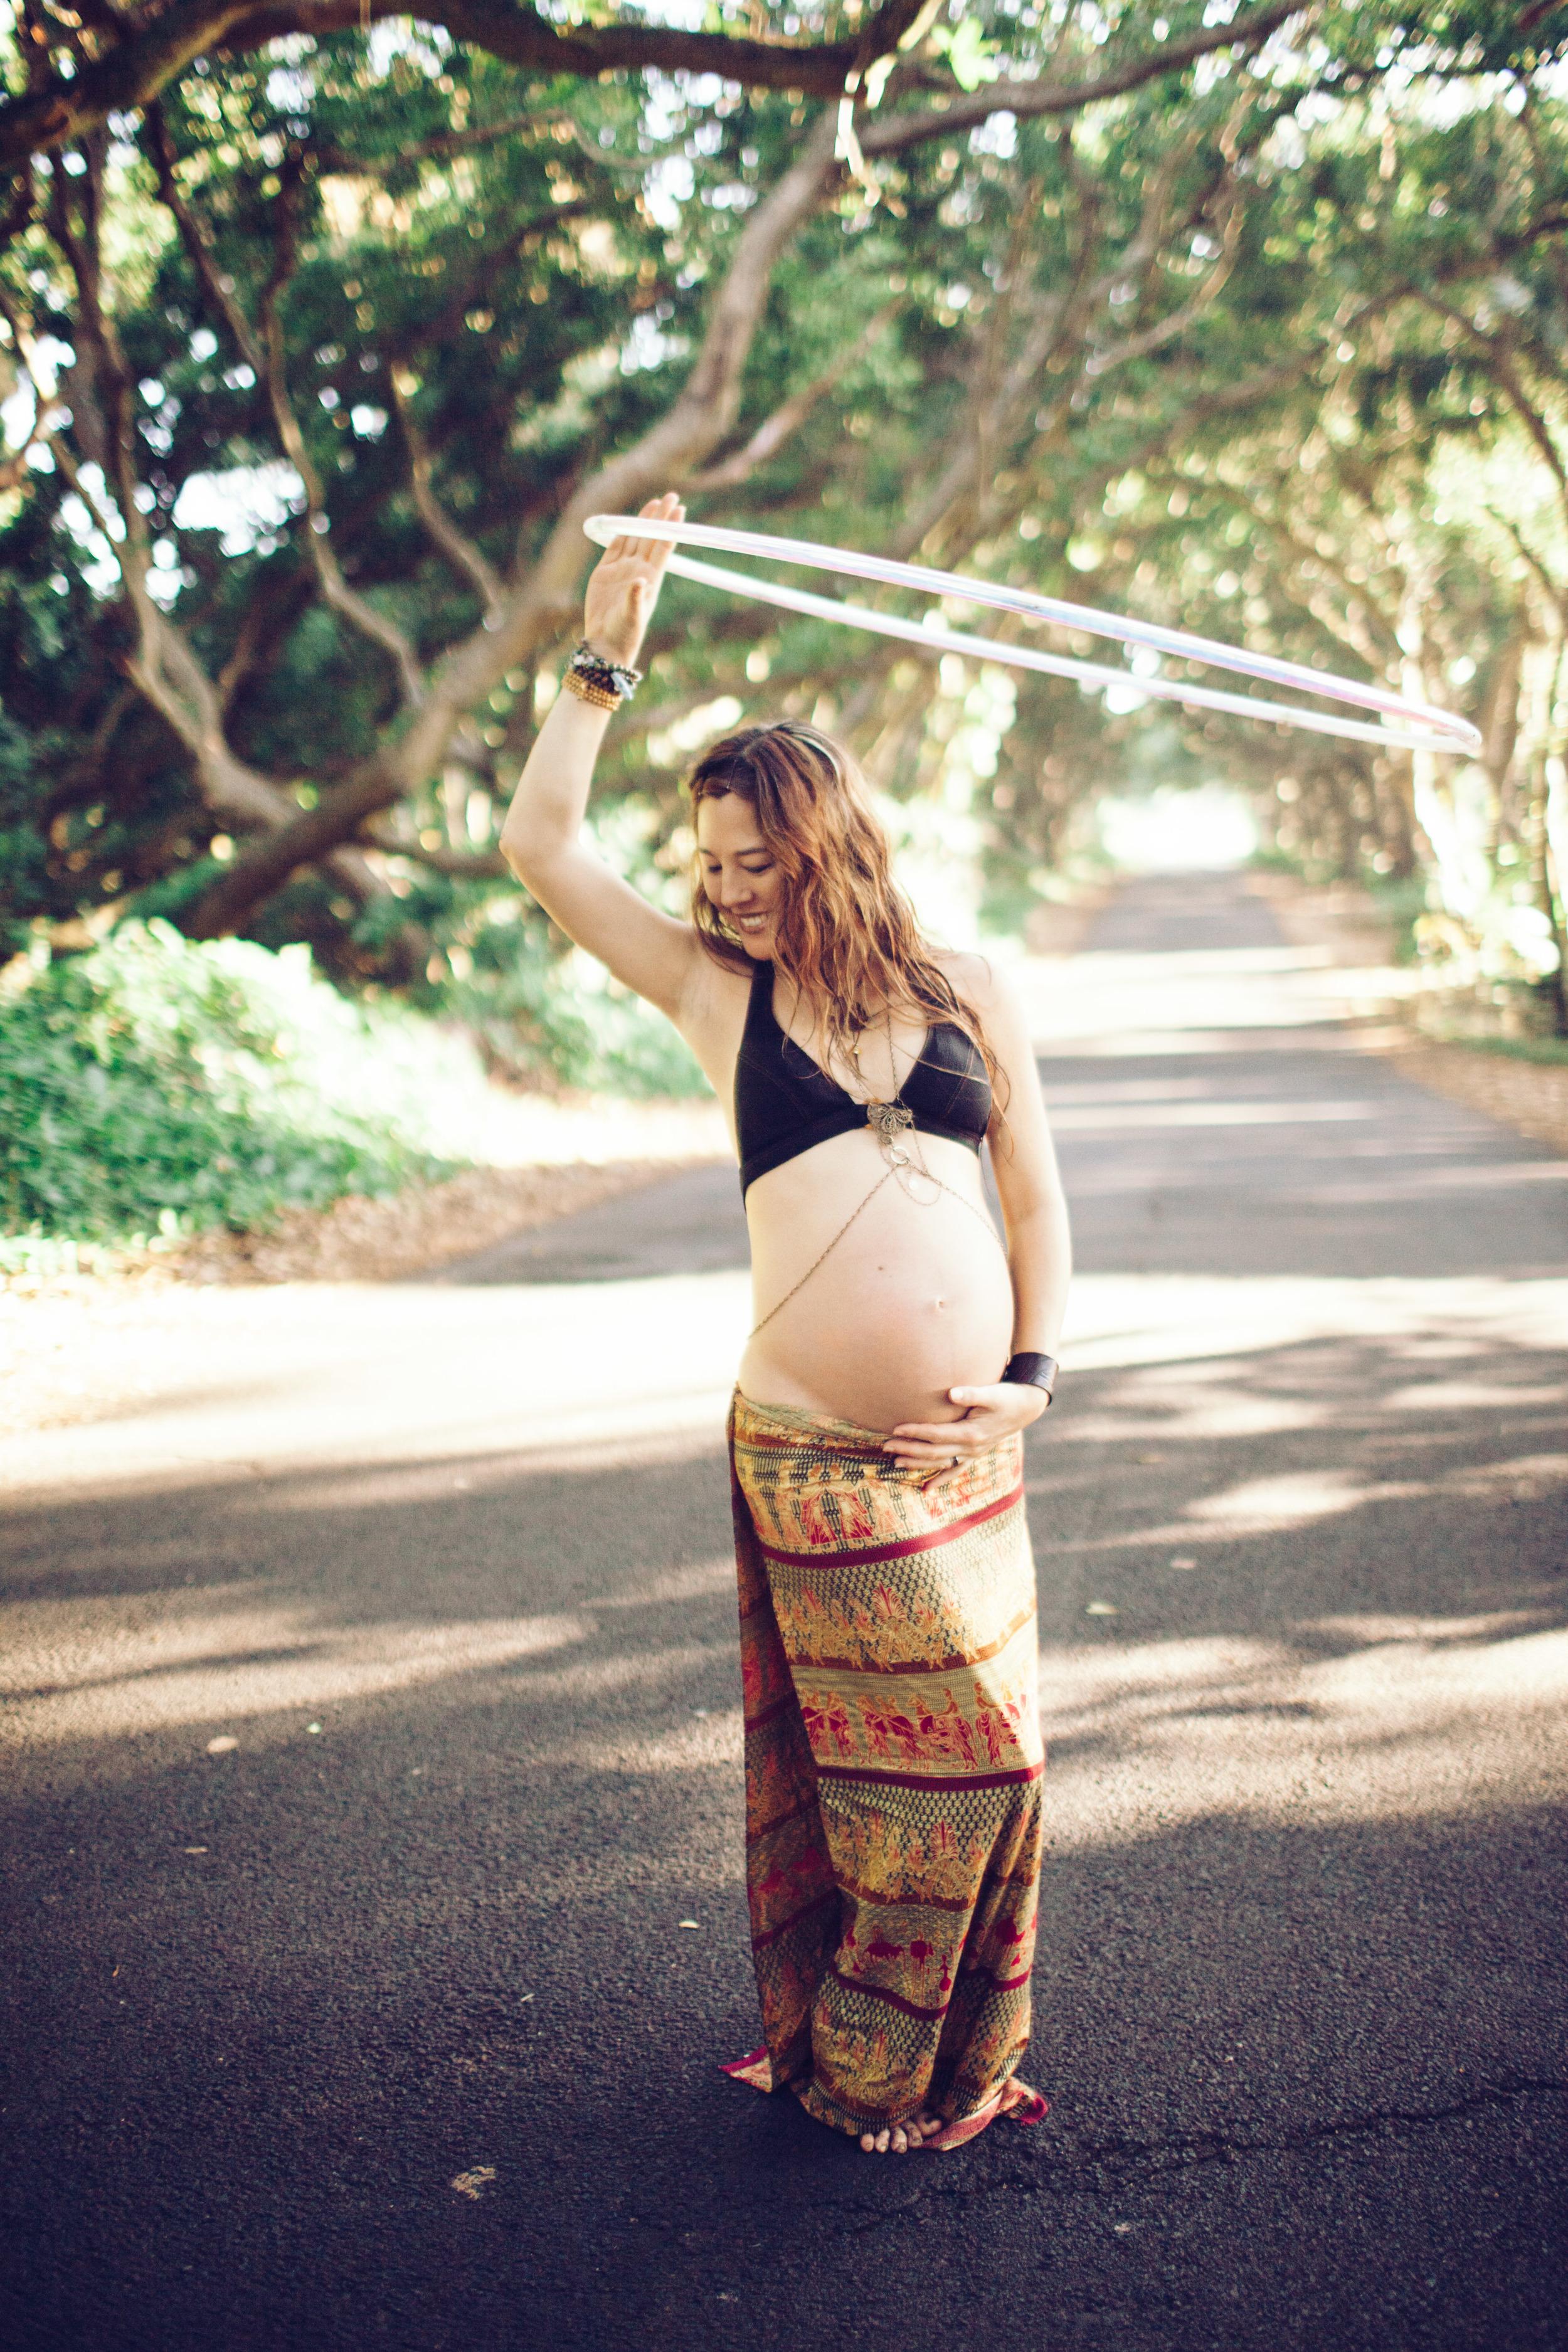 jinju-nova-maternity-3361.jpg